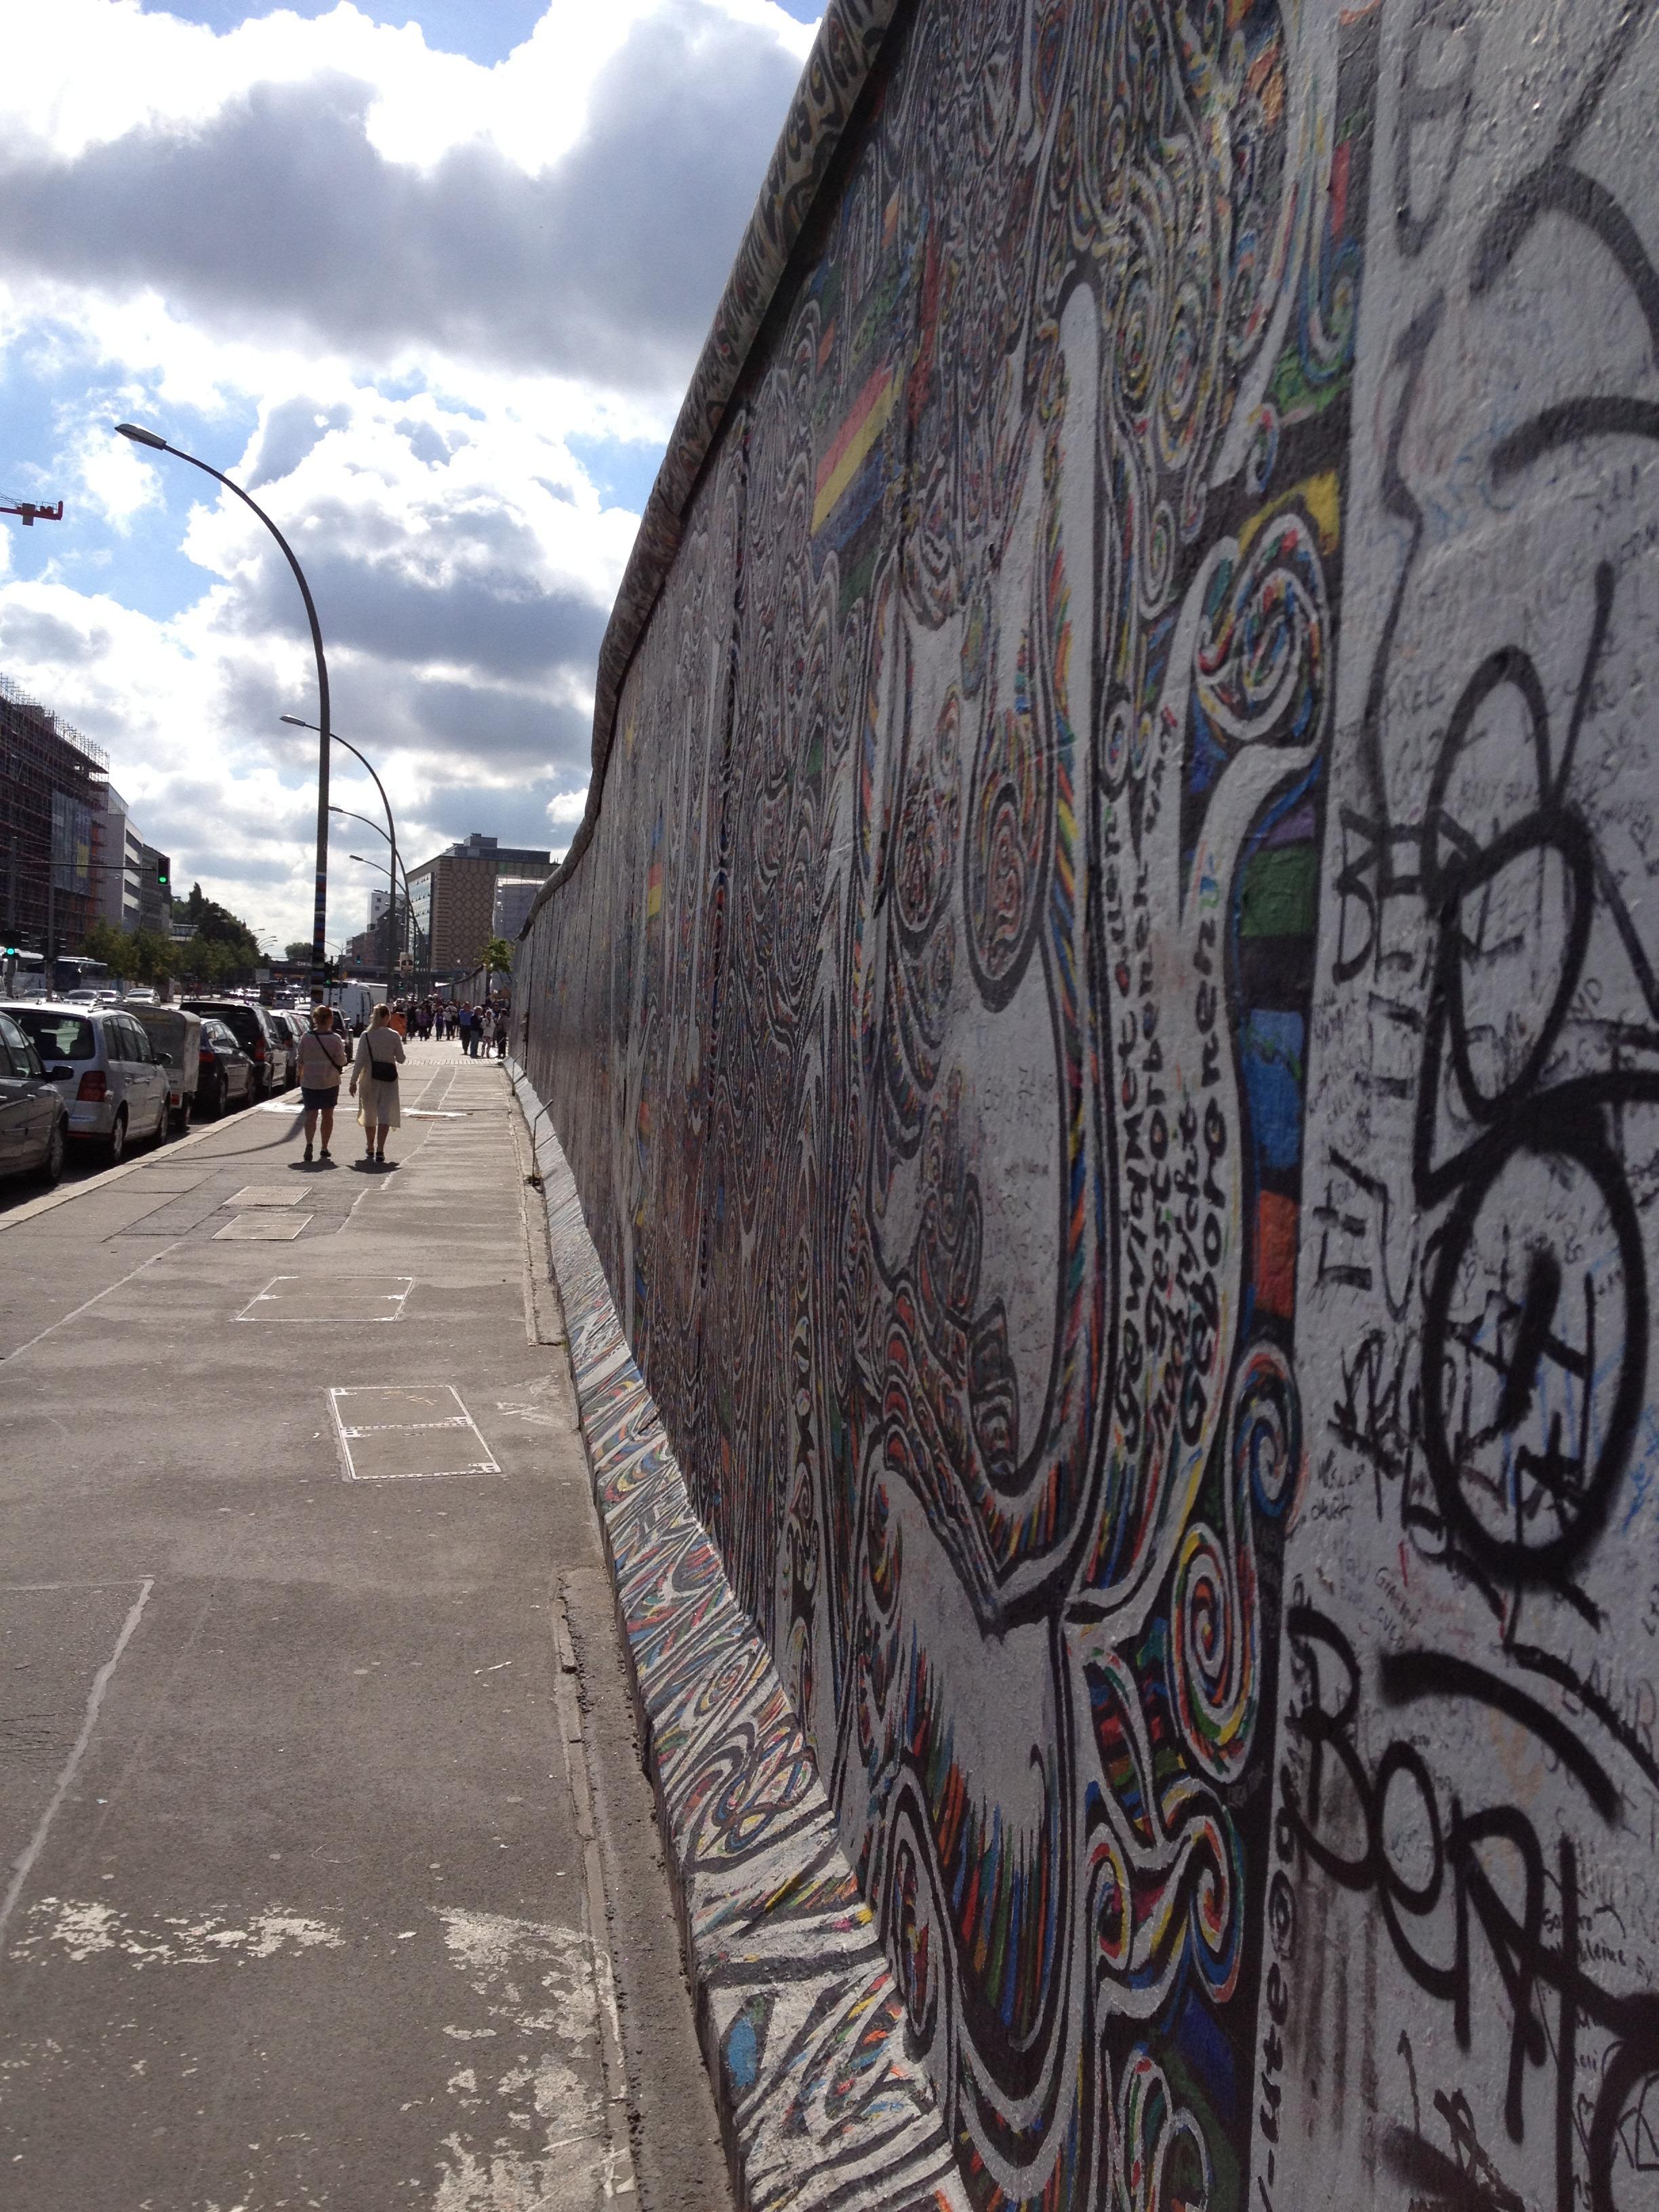 Grafiti wall berlin - Road Street Wall Europe Historic Graffiti Lane Painting Street Art Art Infrastructure Signs Mural Germany Berlin